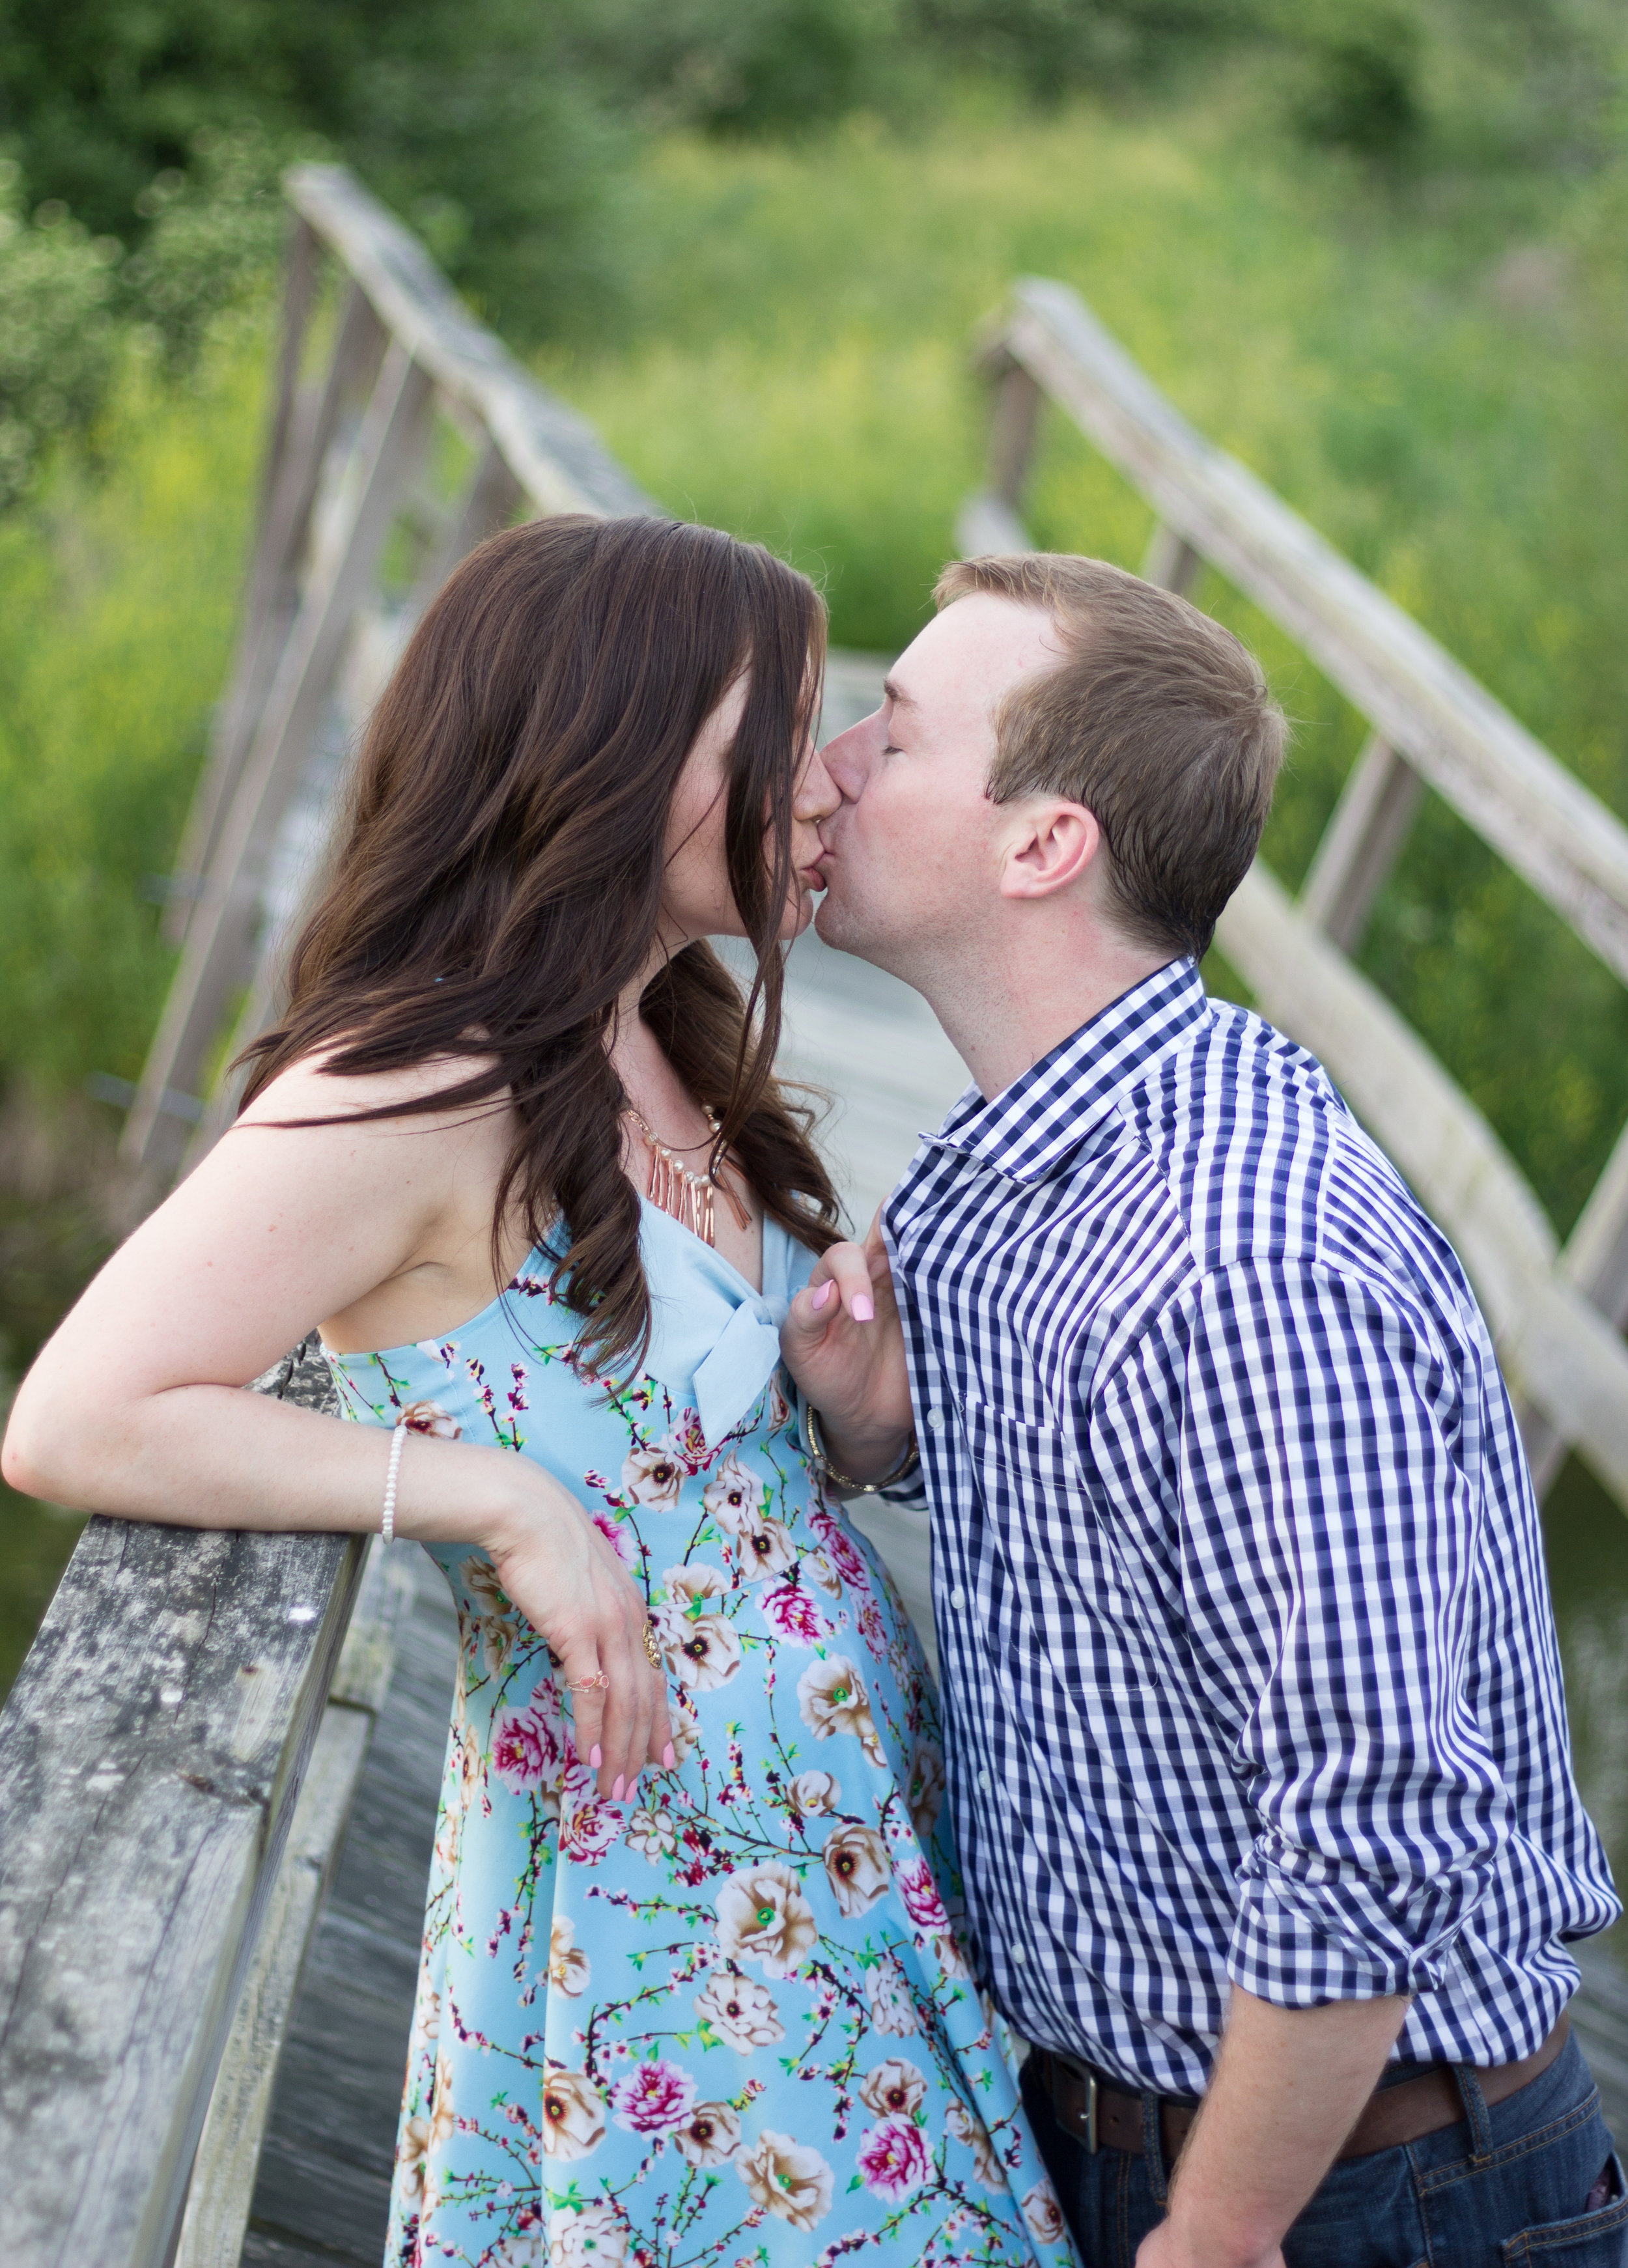 Blake & Abbie_Engagement_313 - 20170604-13.jpg